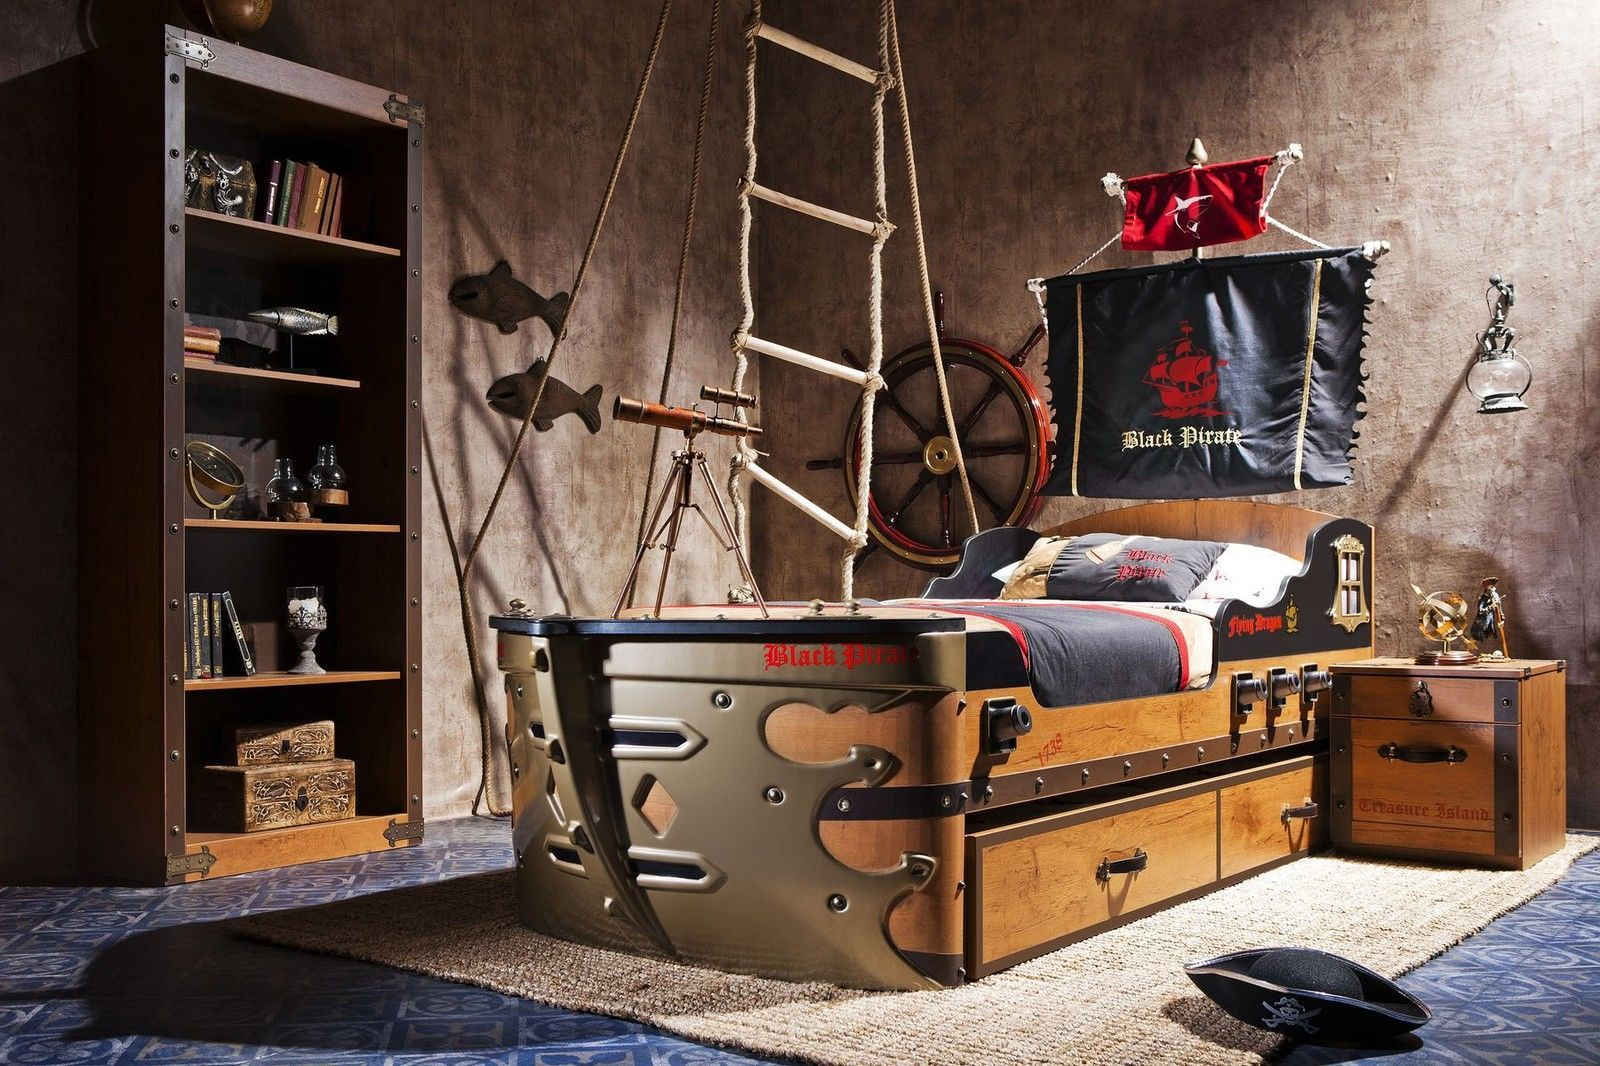 Kinderbett junge pirat  Schiffbett BLACK PIRATE, Cilek Möbel, Kinderbett, Kindermöbel, TUV ...